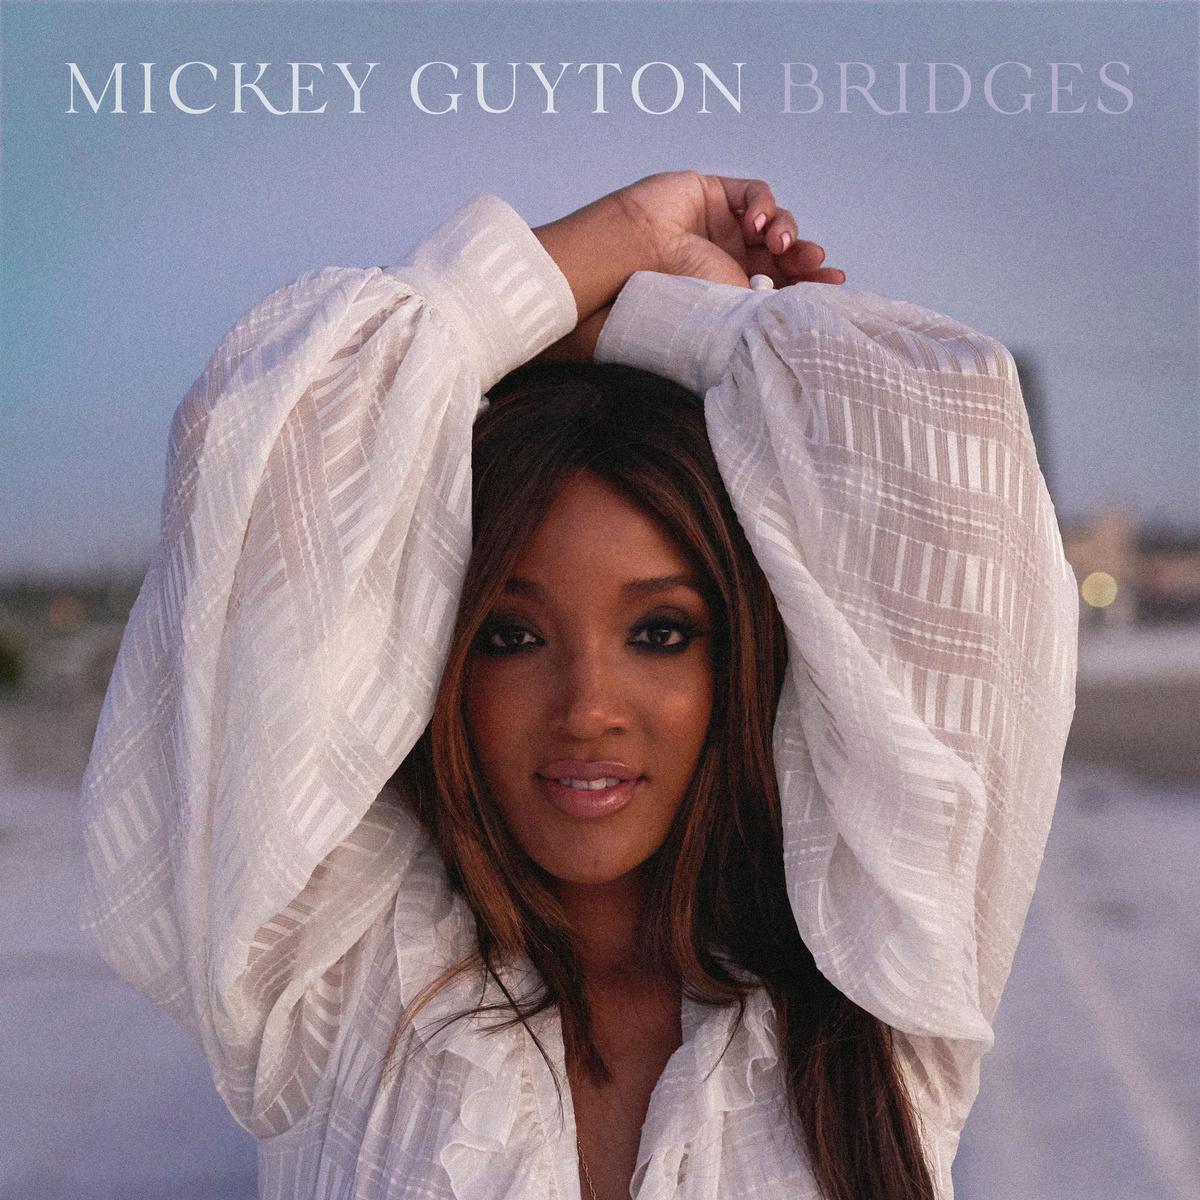 mickey-guyton-bridges